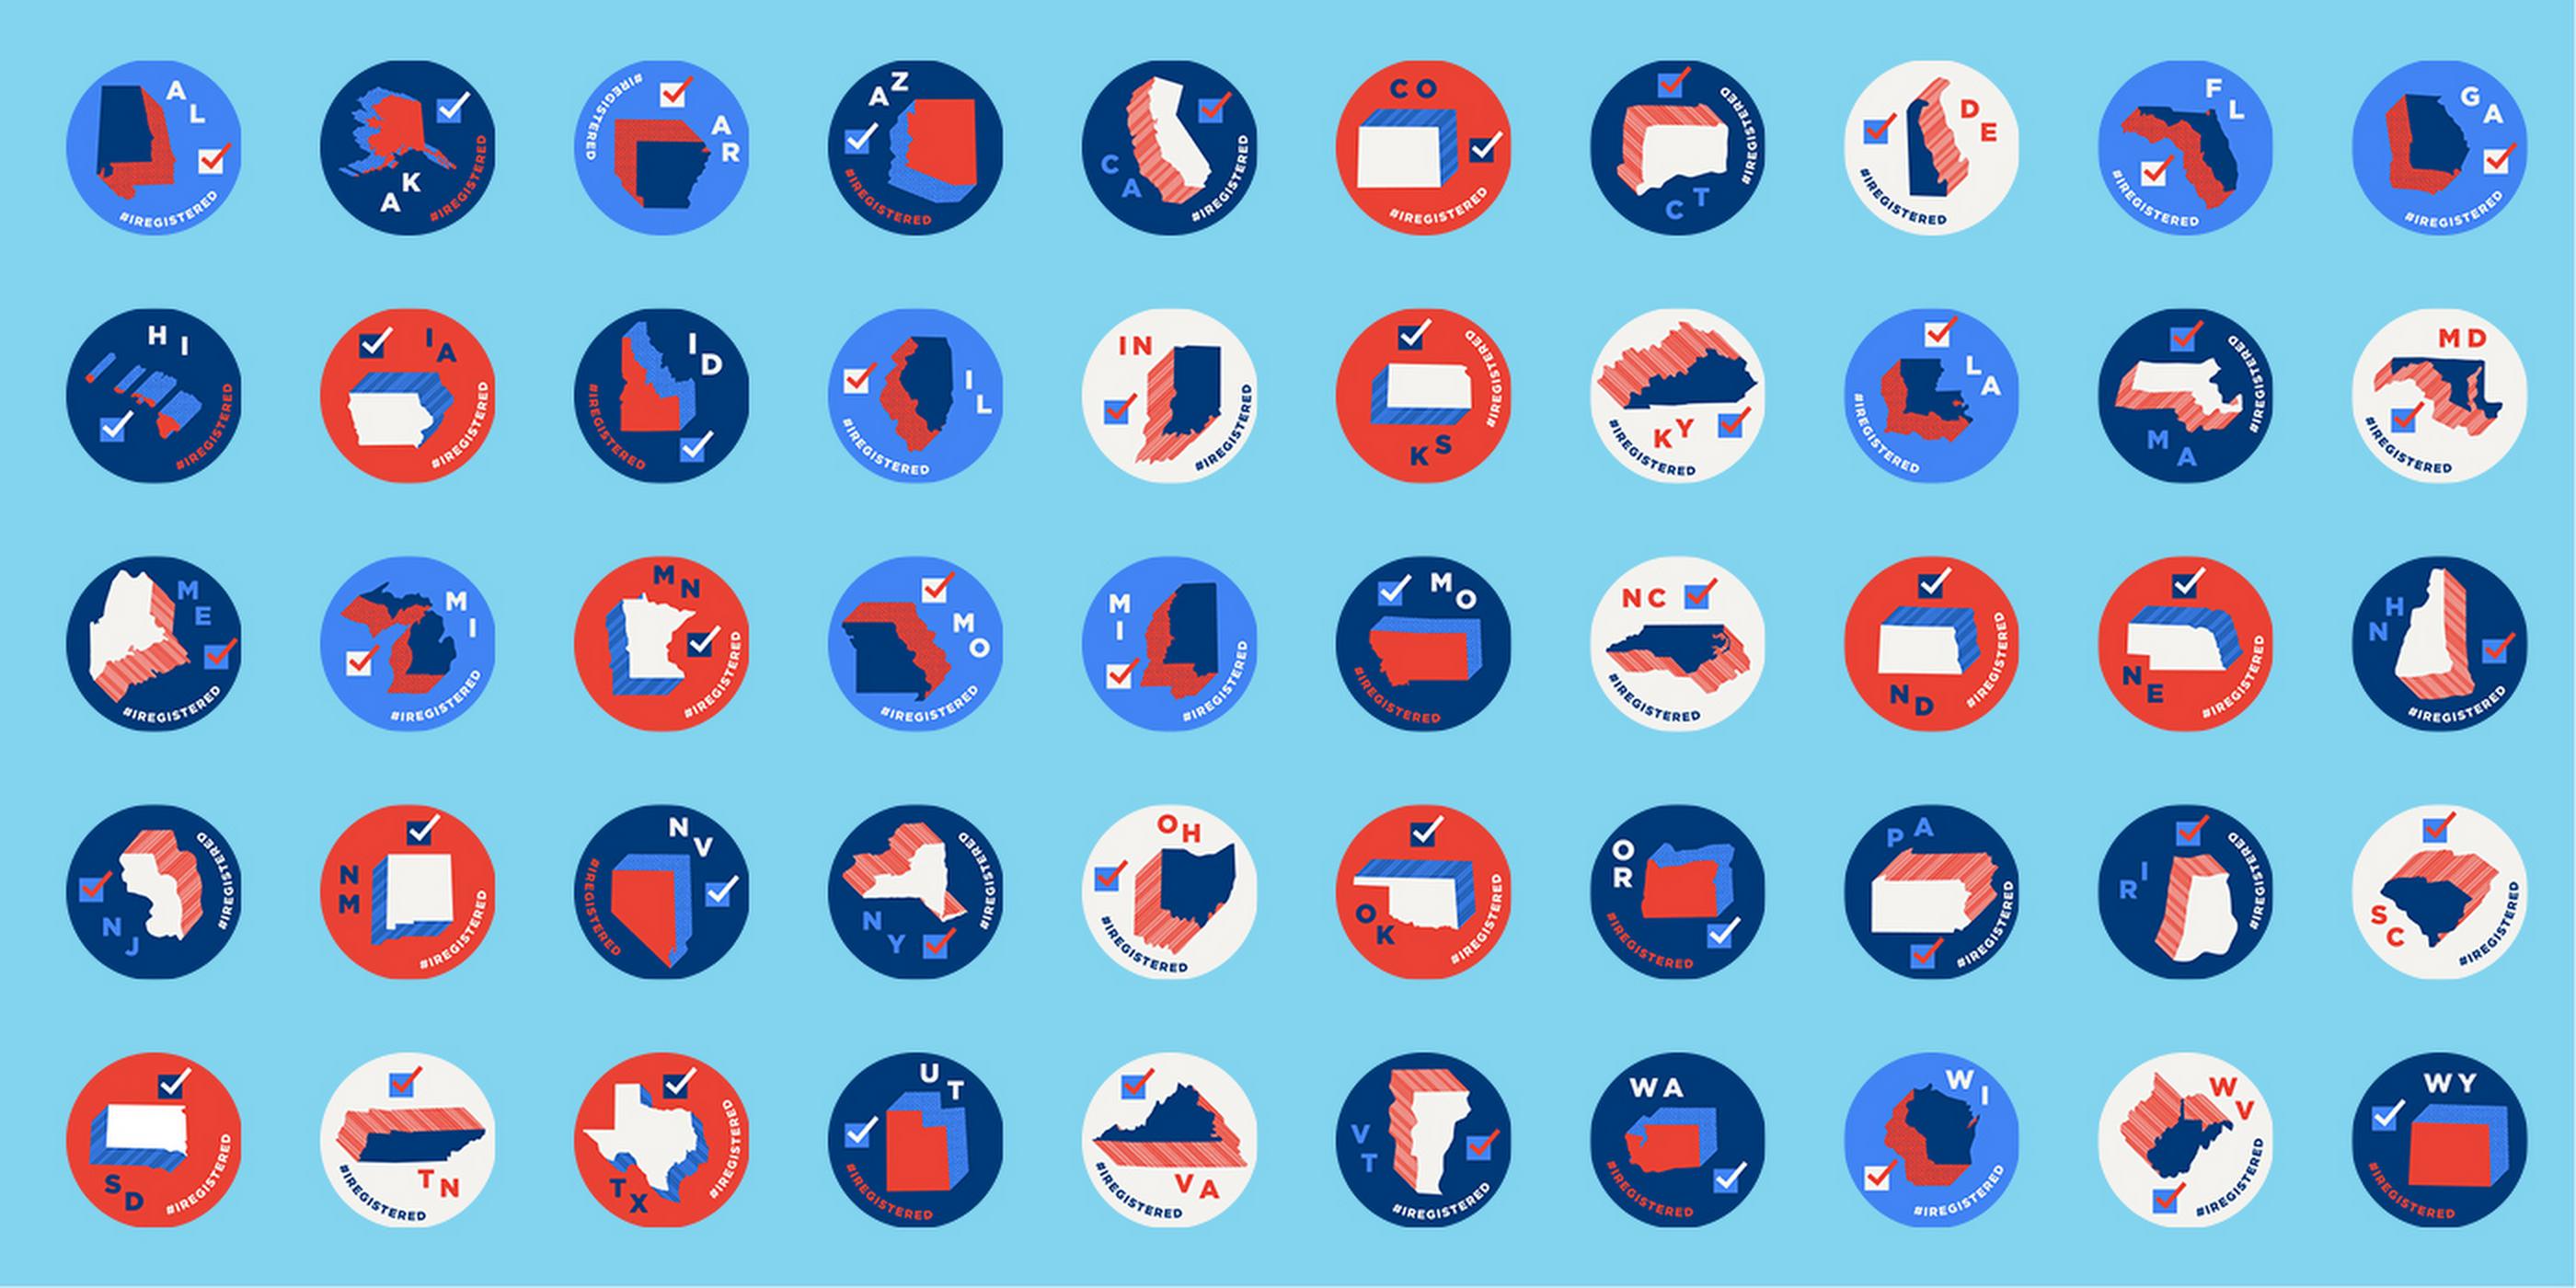 googlevotestates.jpg